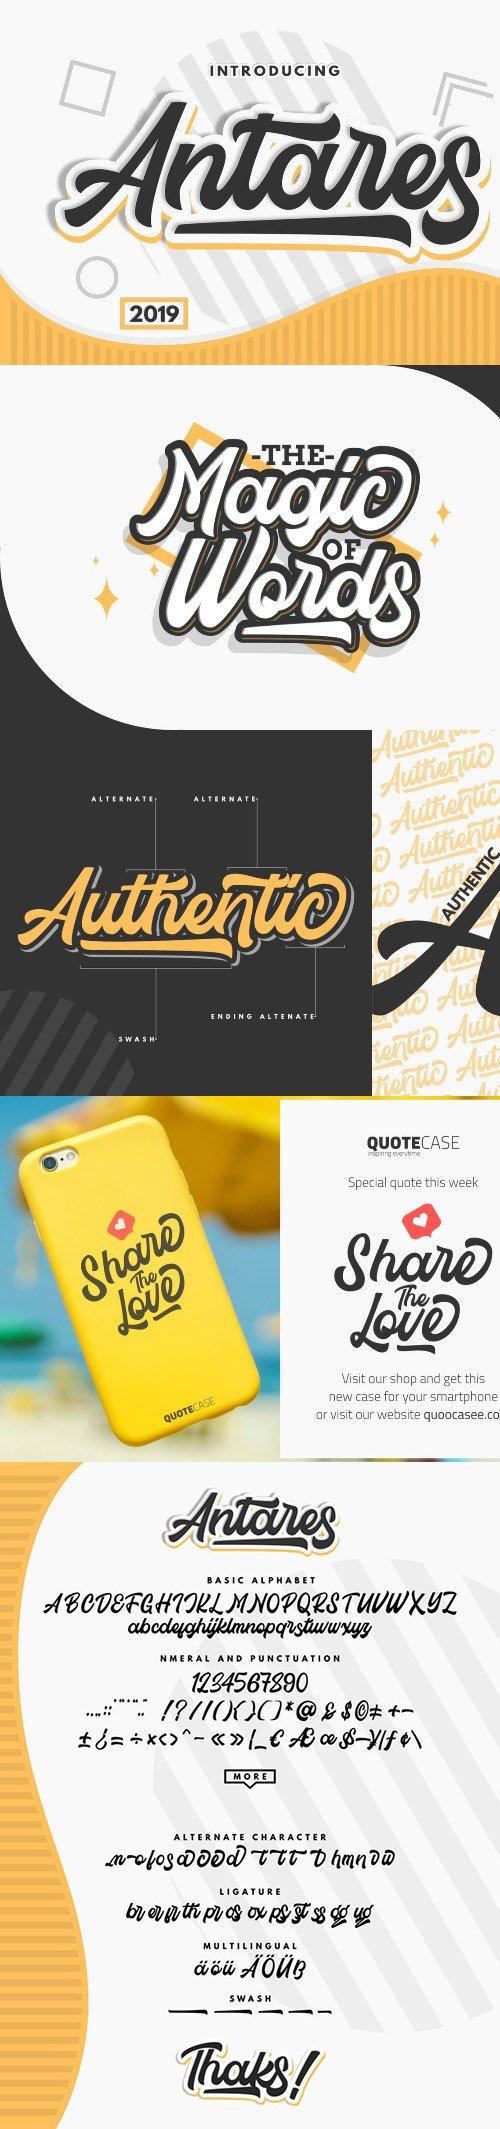 Antares - Authentic Font